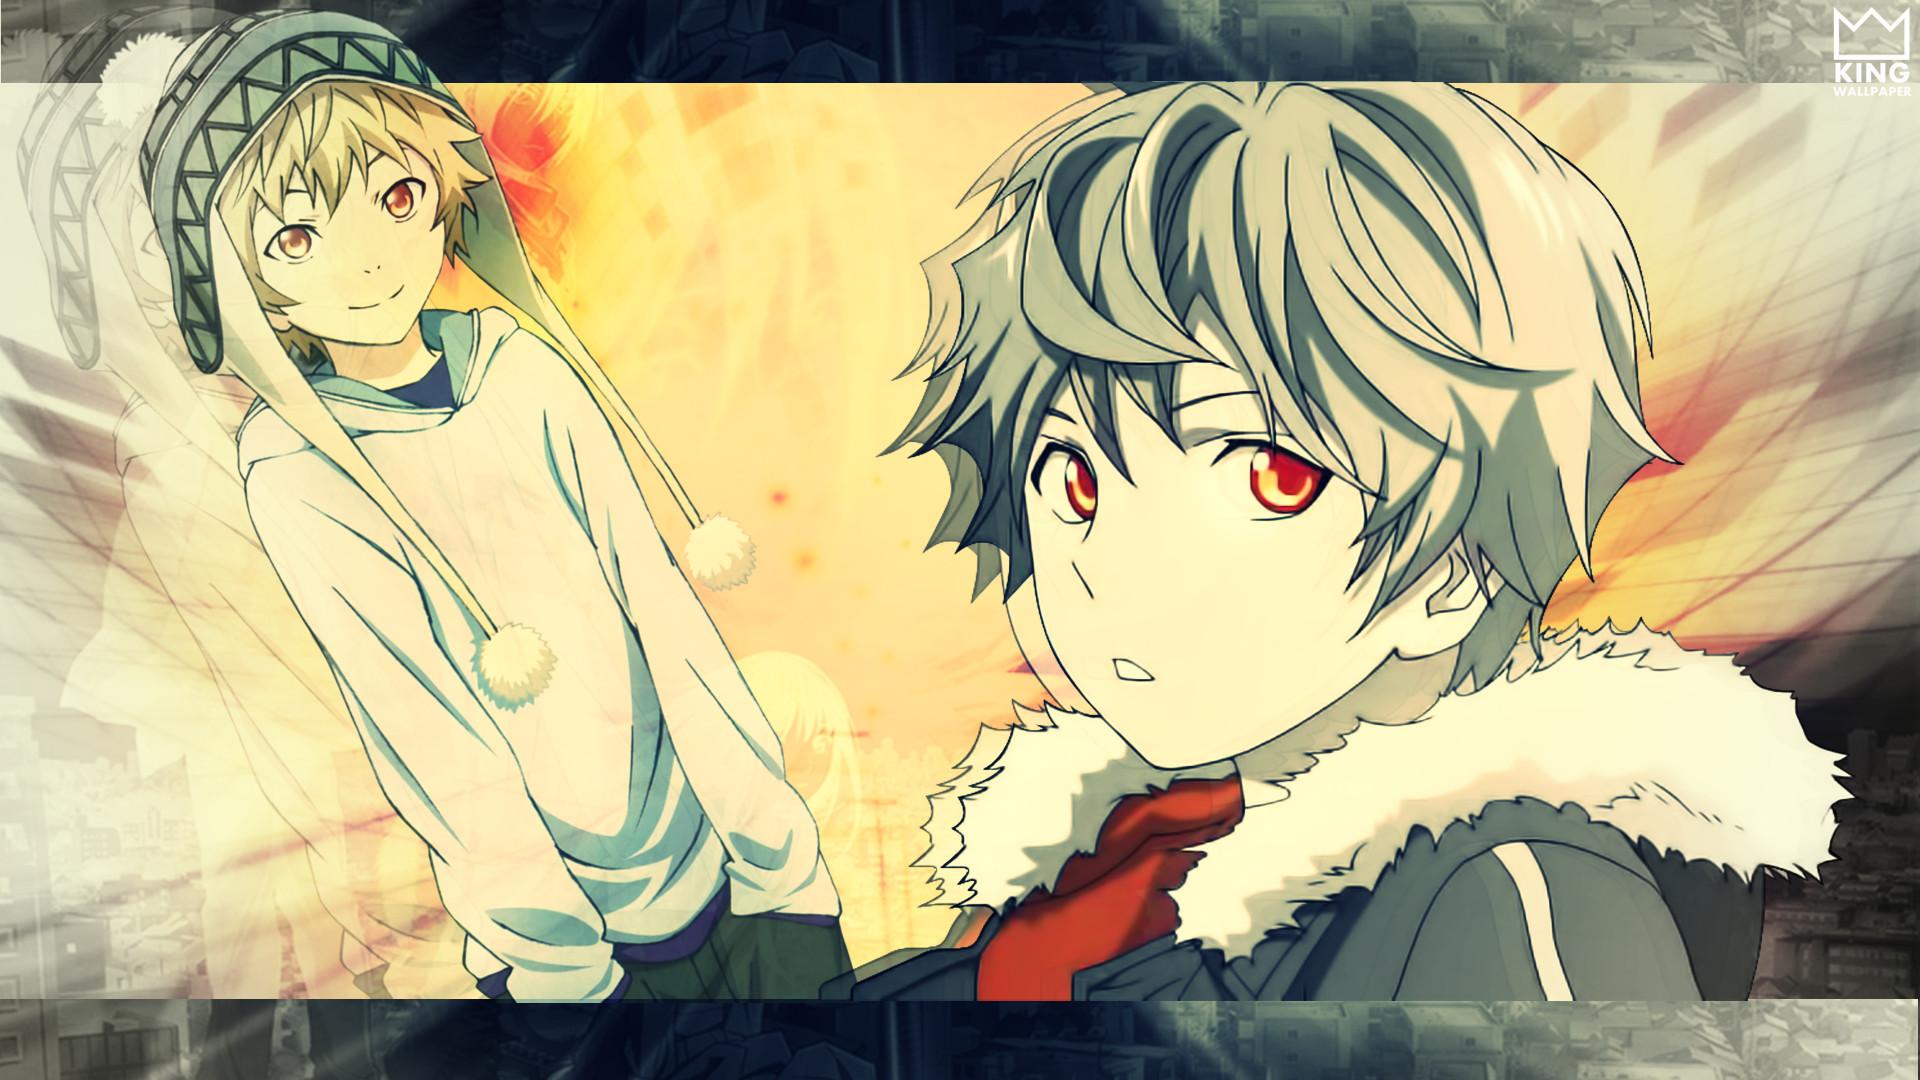 yukine the sinki Anime Noragami Aragoto Wallpaper HD 2015